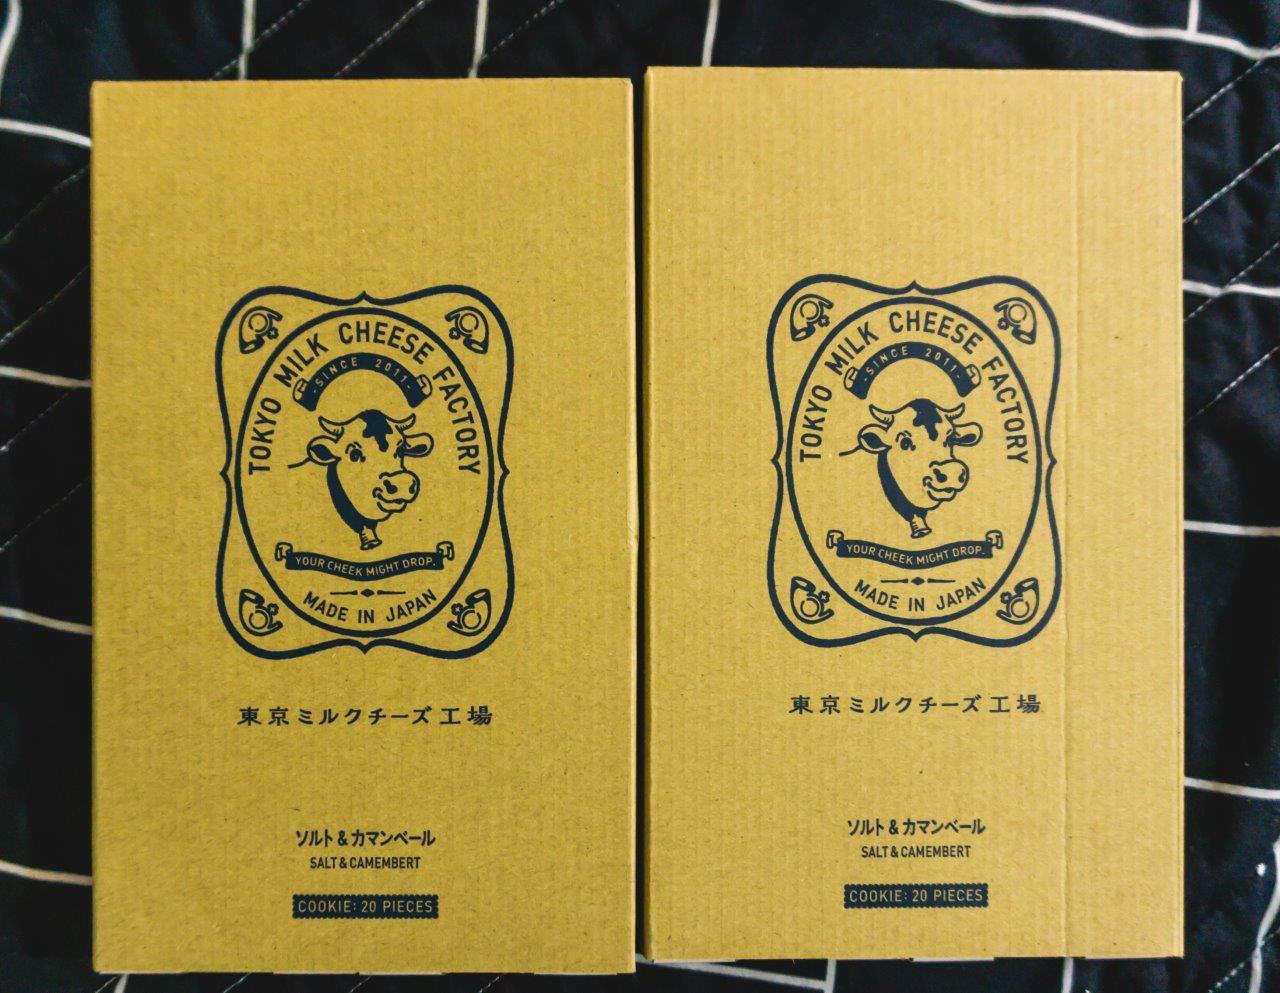 tokyo milk cheese factory online, what to get in japan tokyo